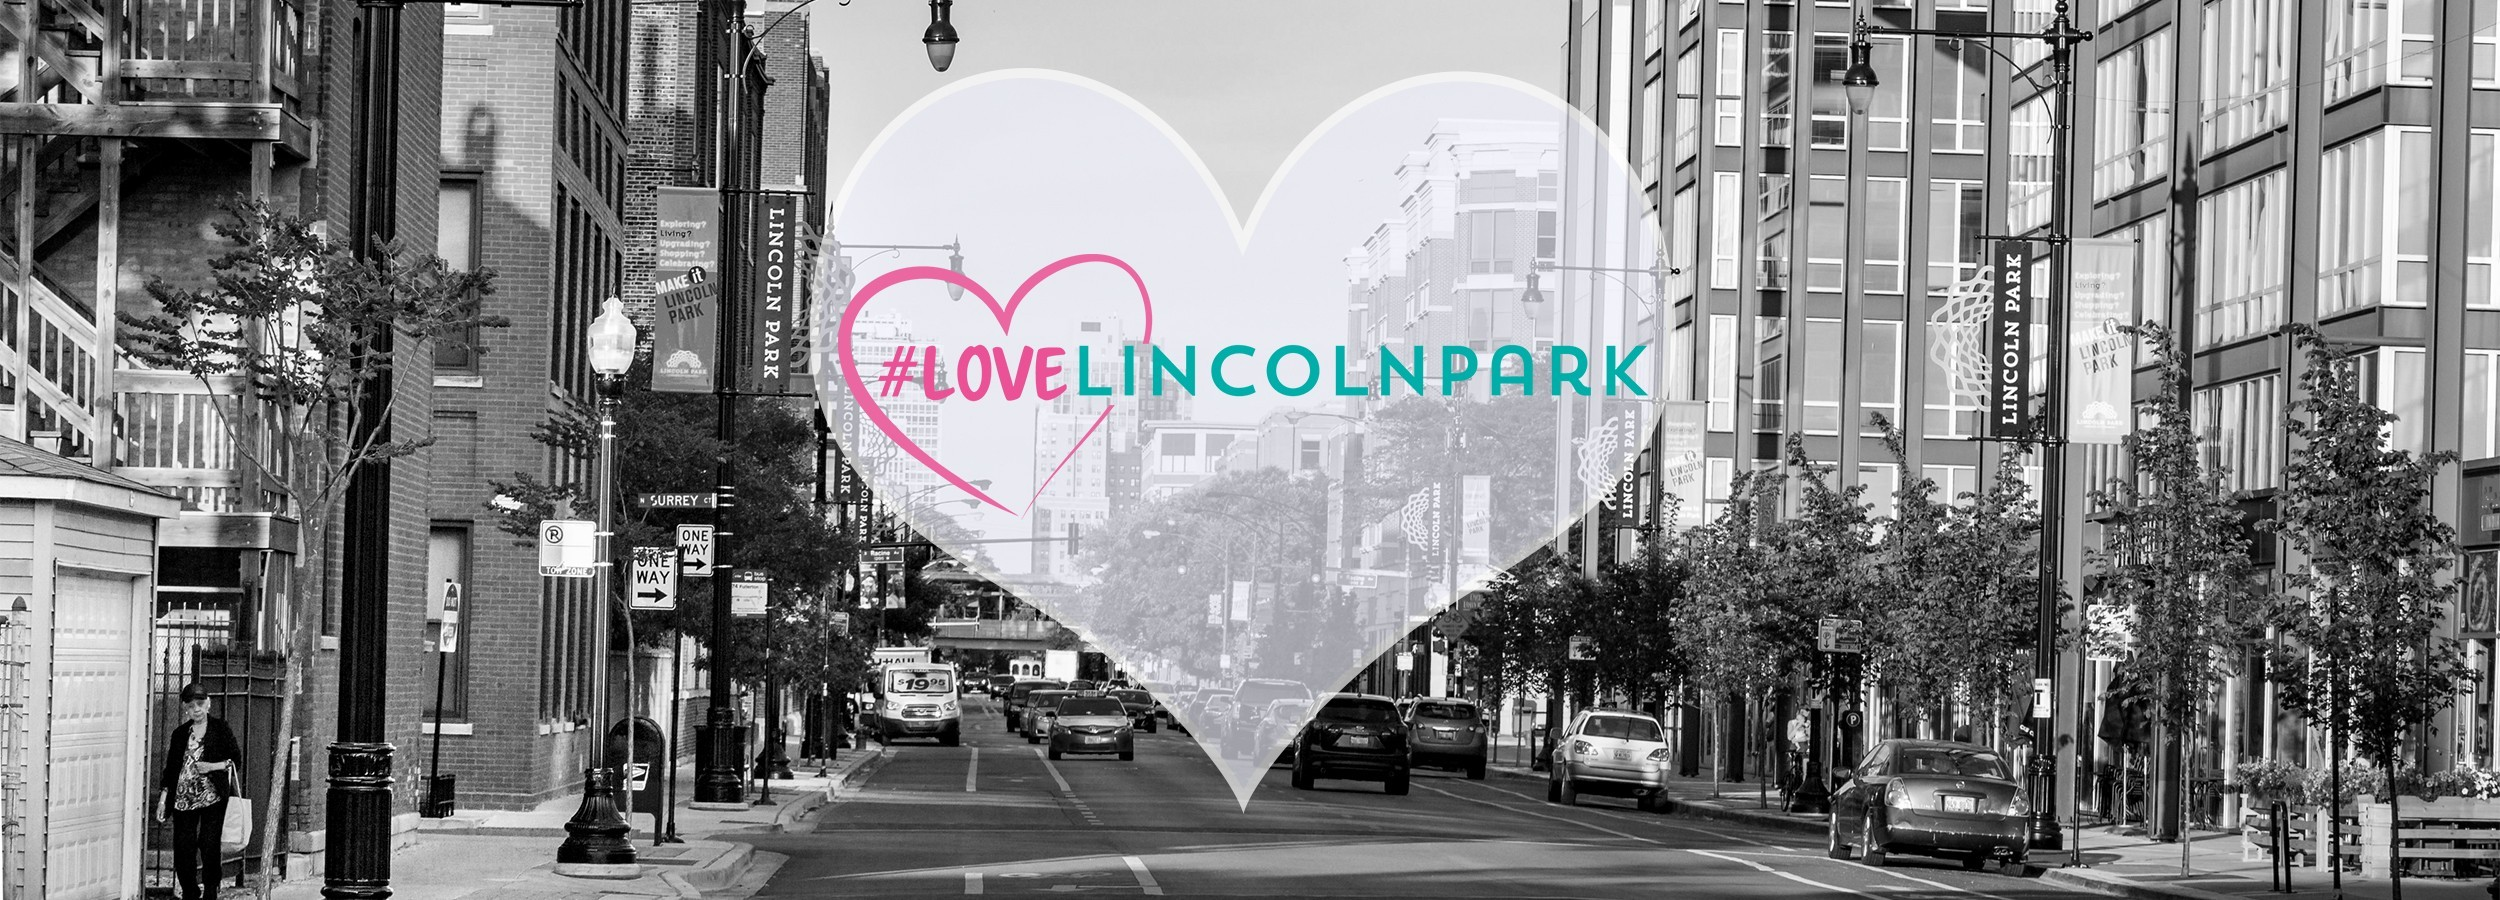 Love Lincoln Park